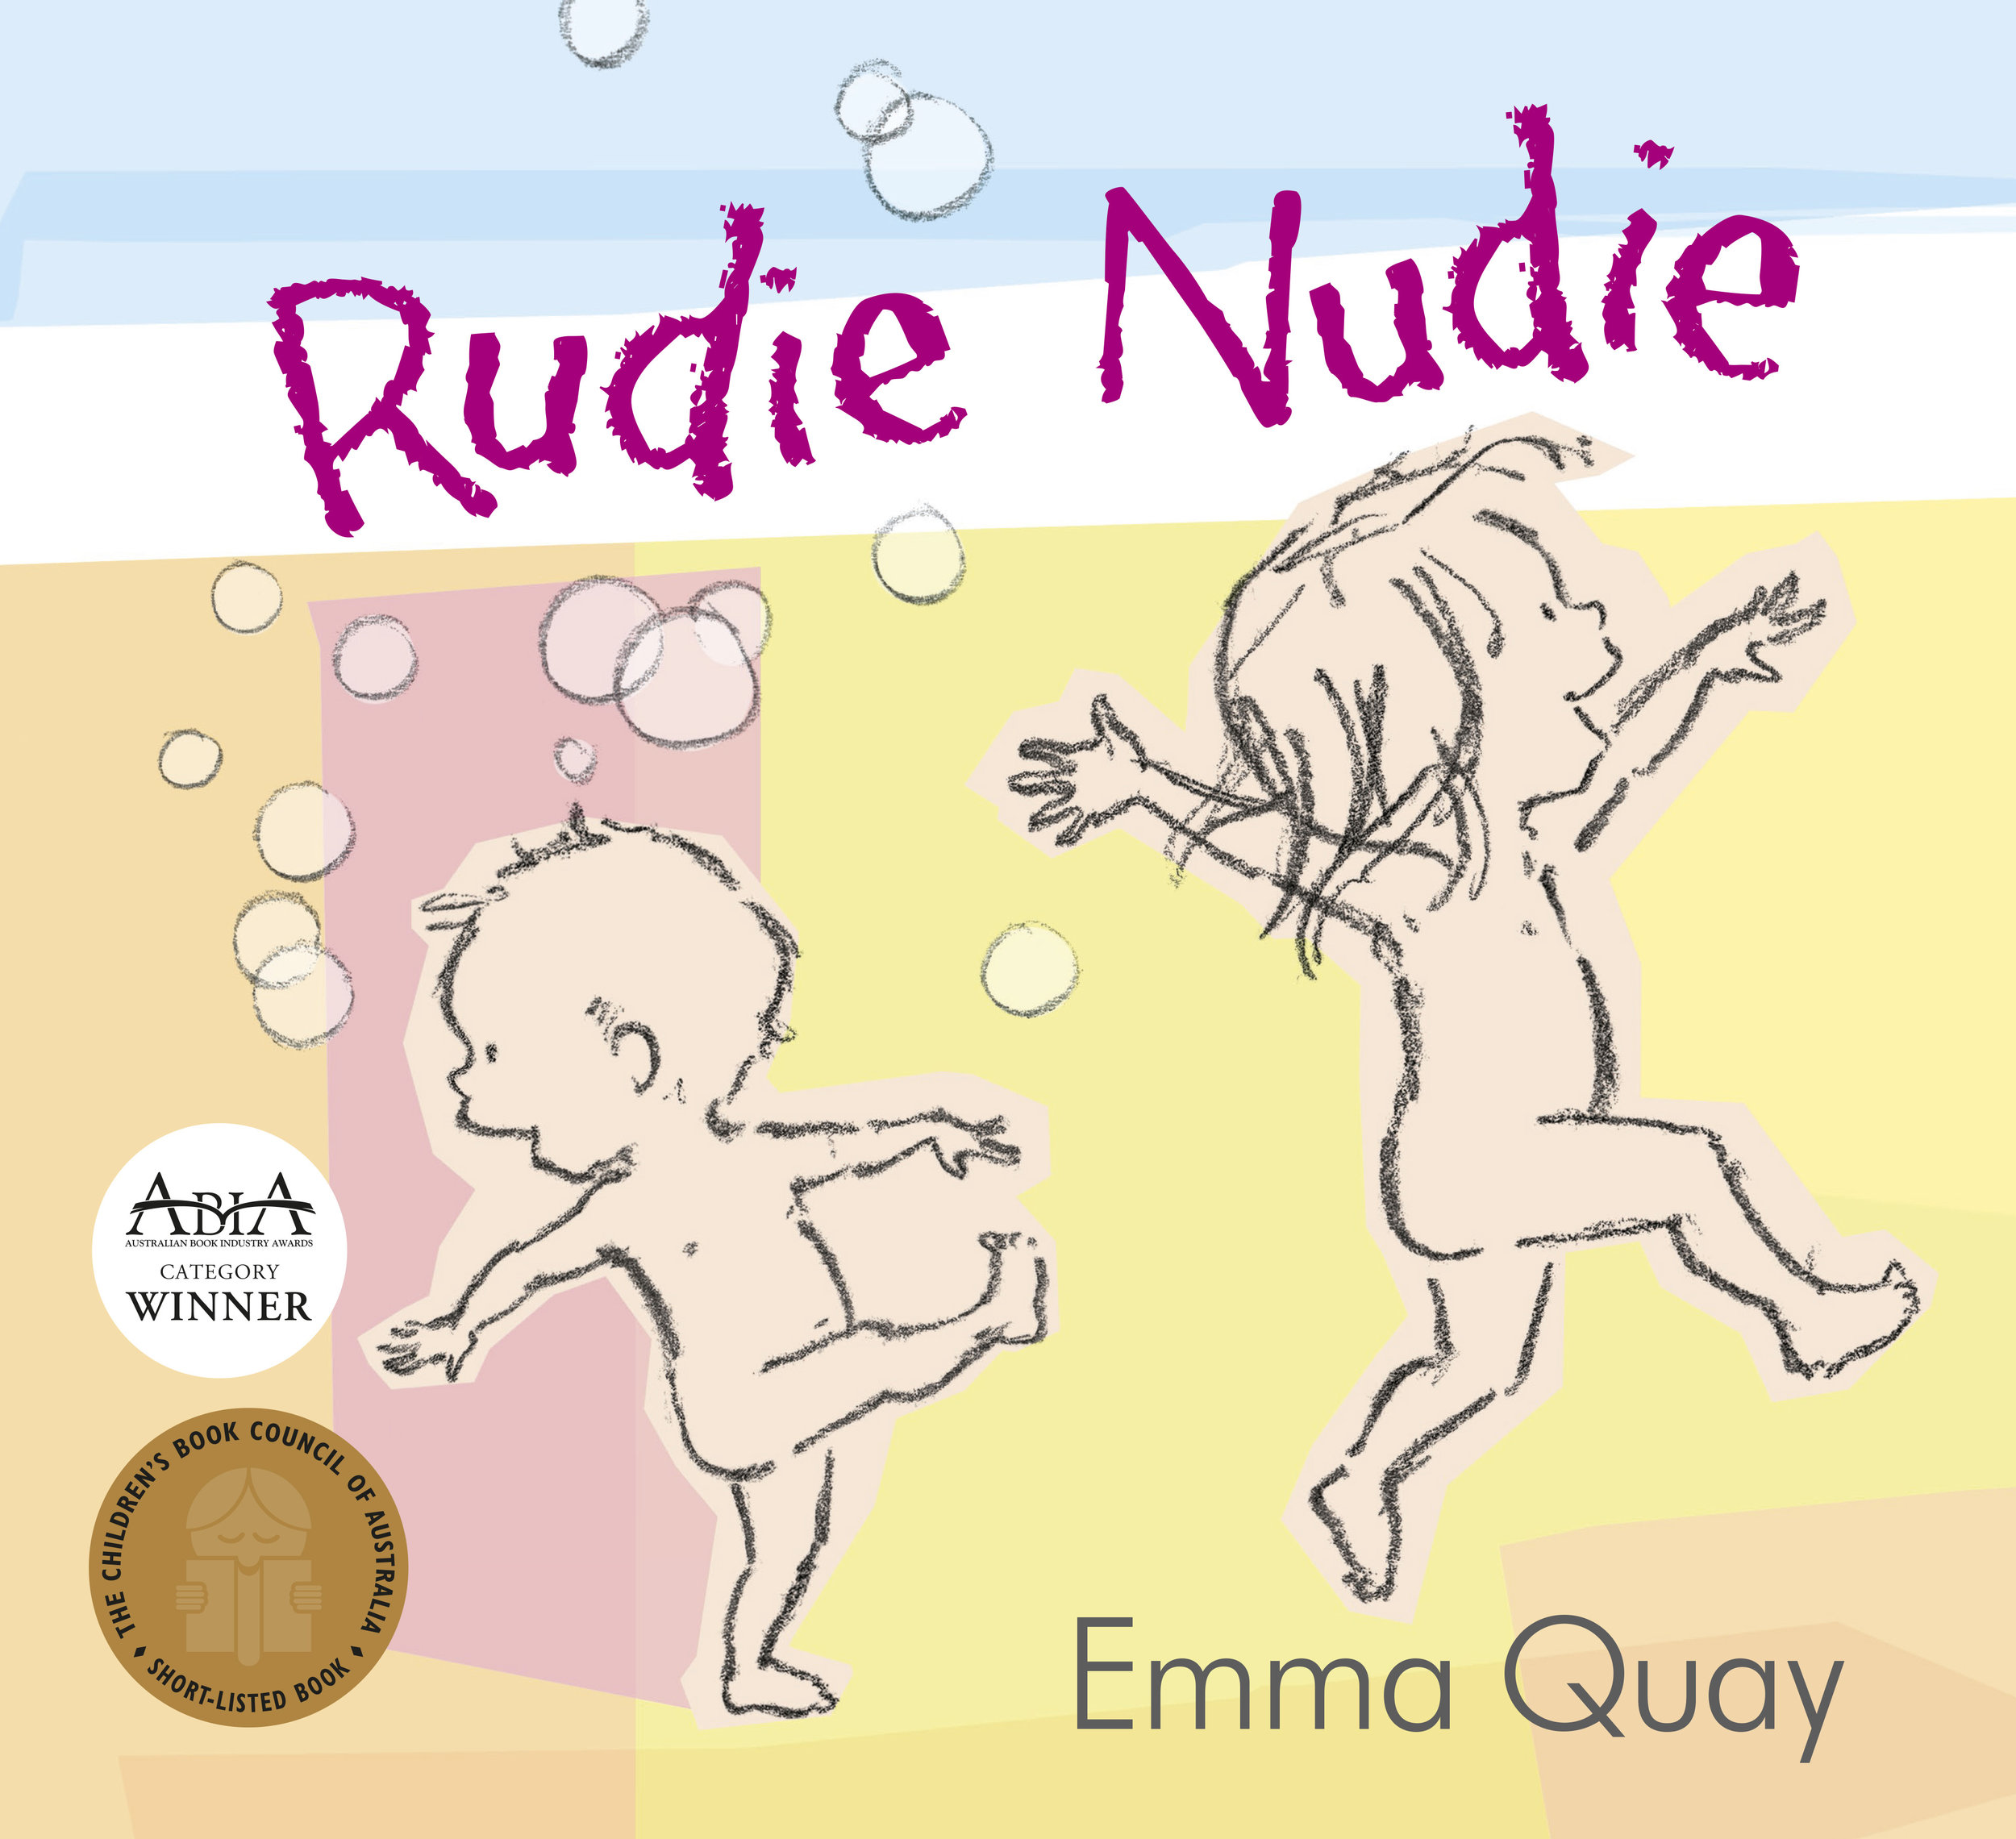 RUDIE NUDIE by Emma Quay (ABC Books)• http://www.emmaquay.com